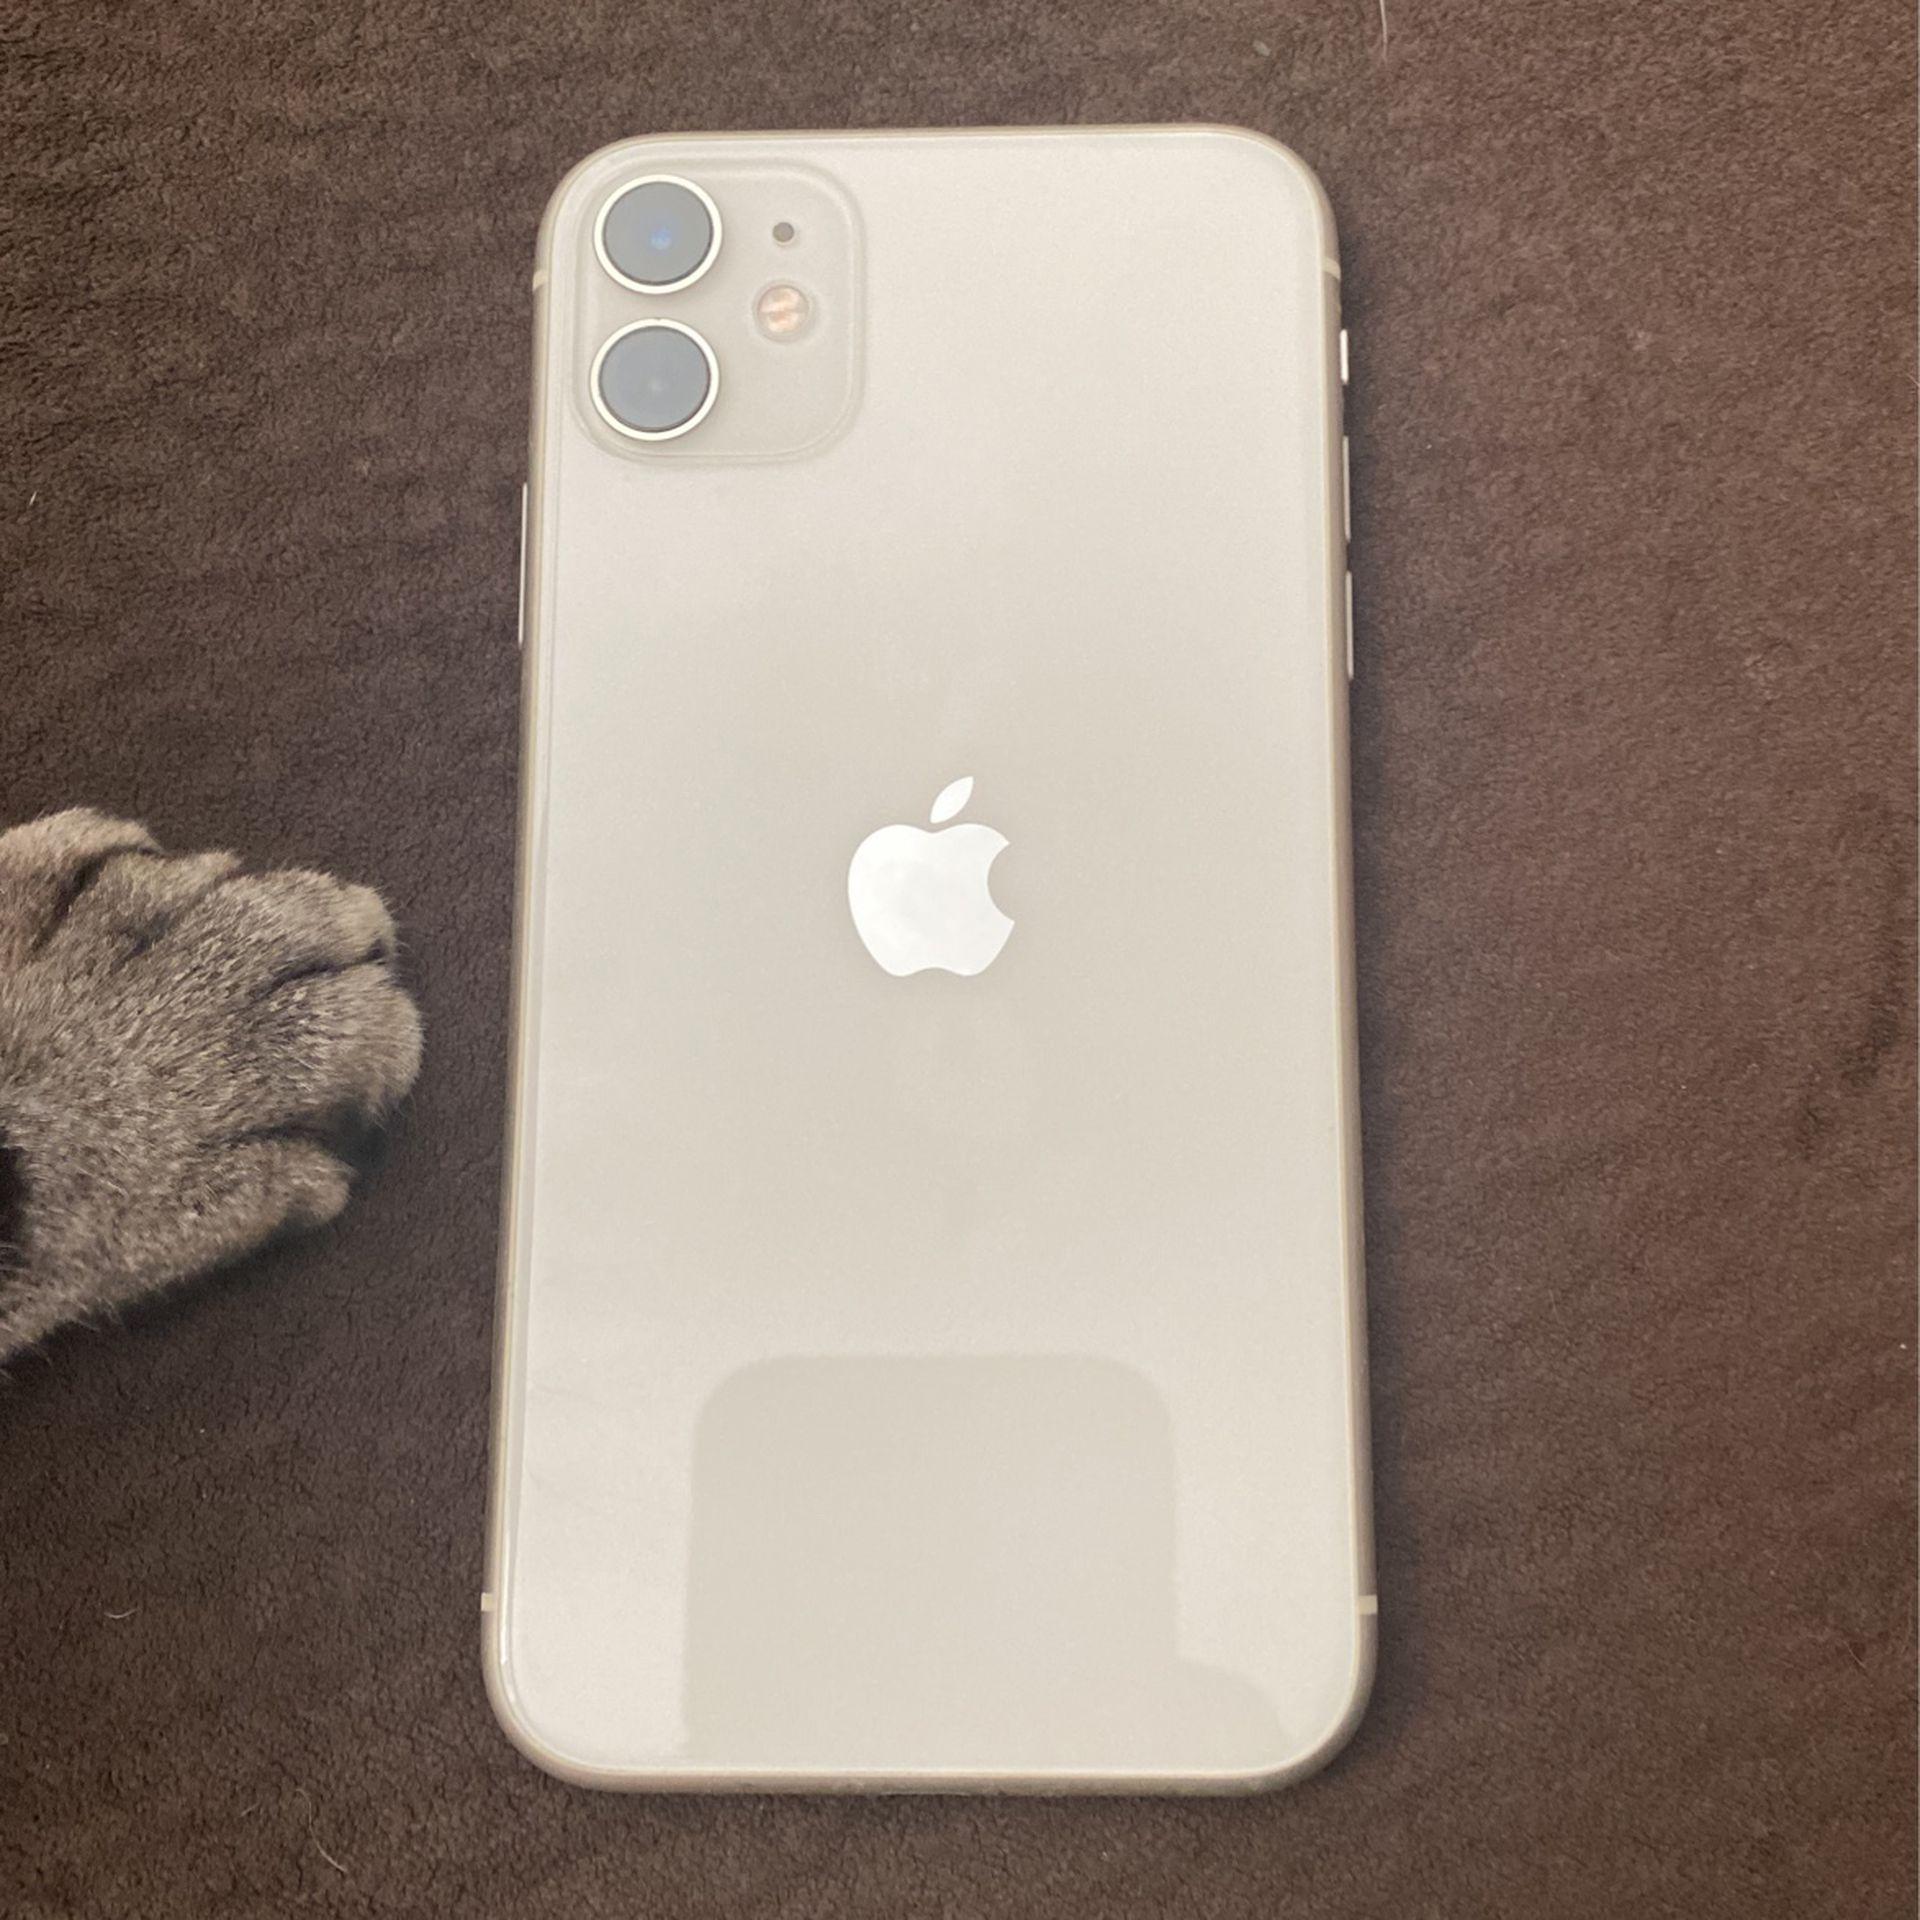 iphone 11 white 128gb sprint network